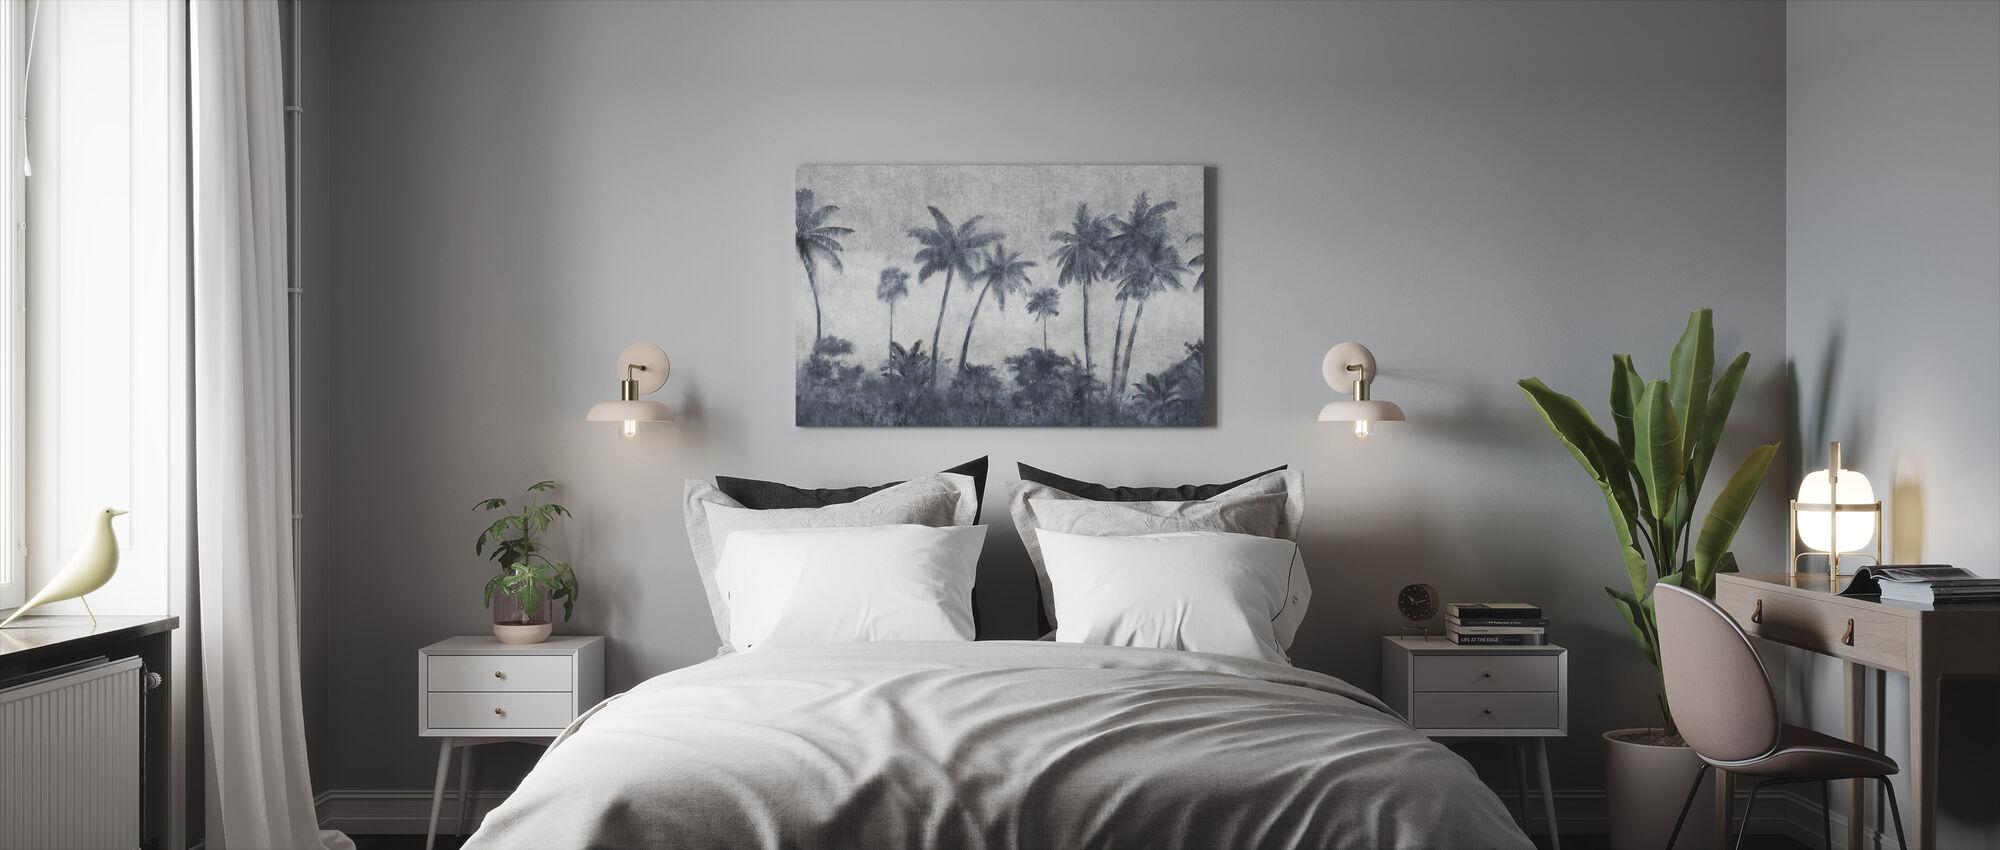 California Palmes on Concrete - Canvas print - Bedroom